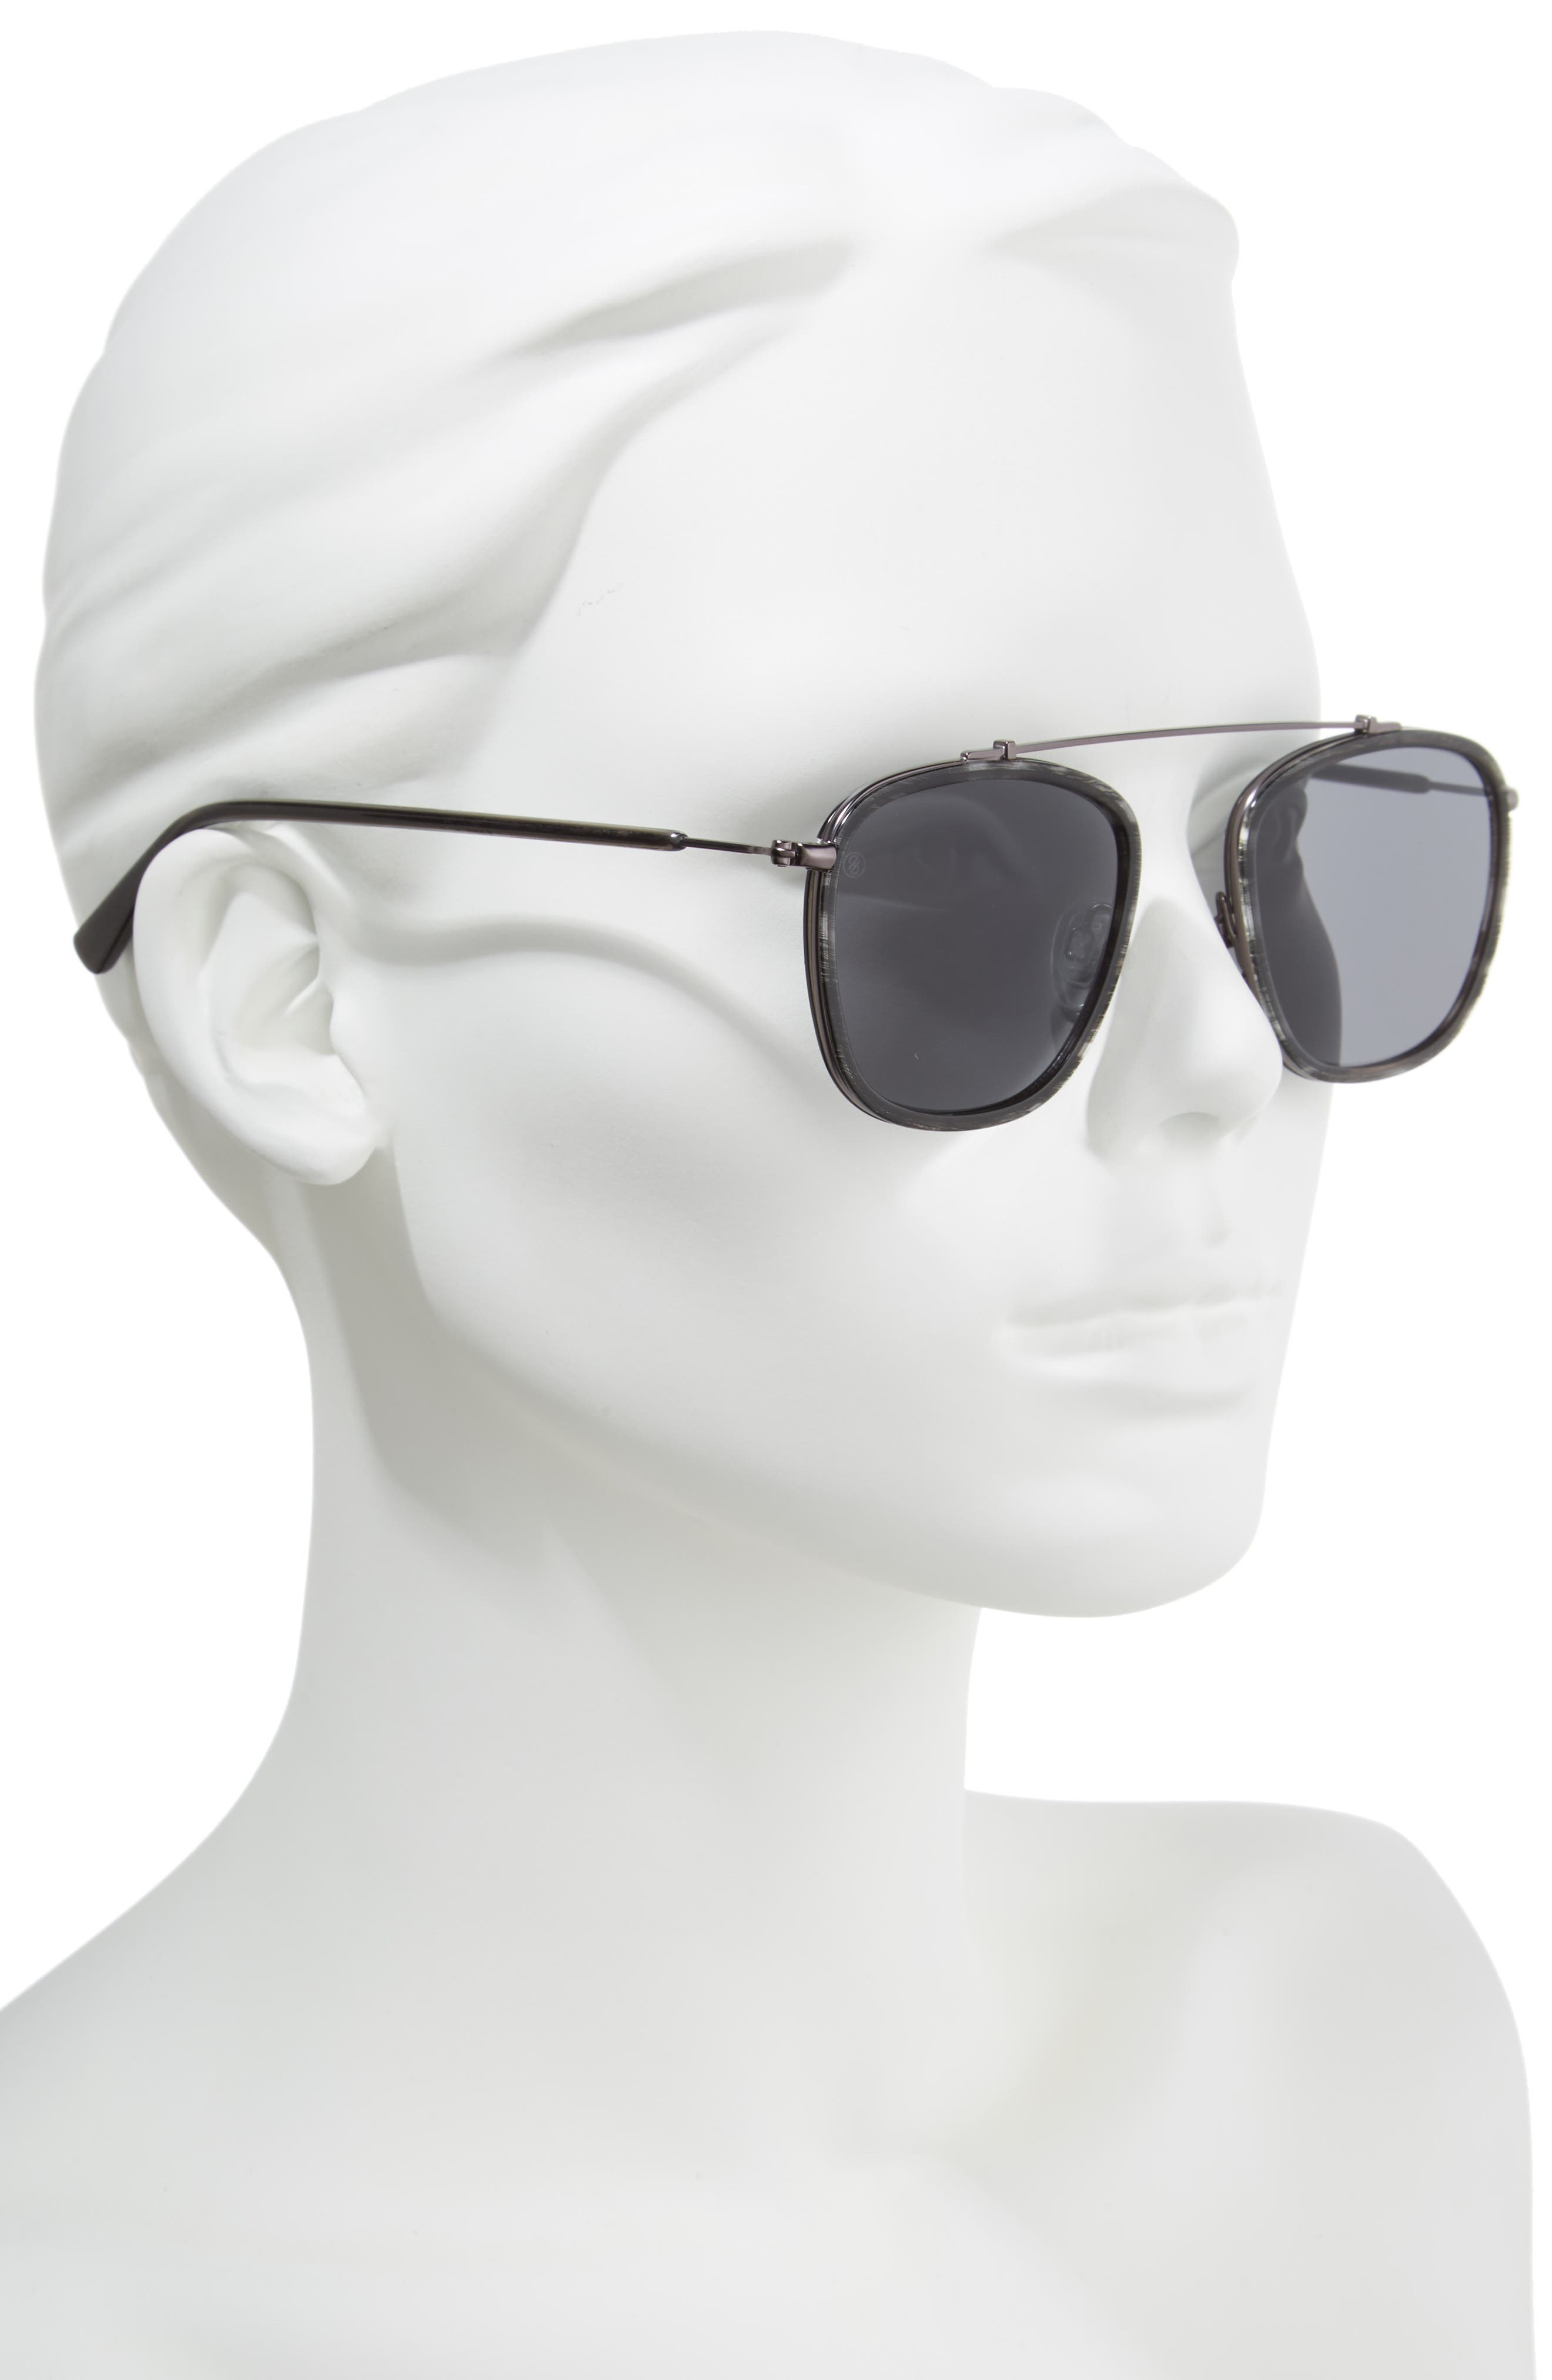 D'BLANC Ceremony 51mm Square Sunglasses,                             Alternate thumbnail 2, color,                             001